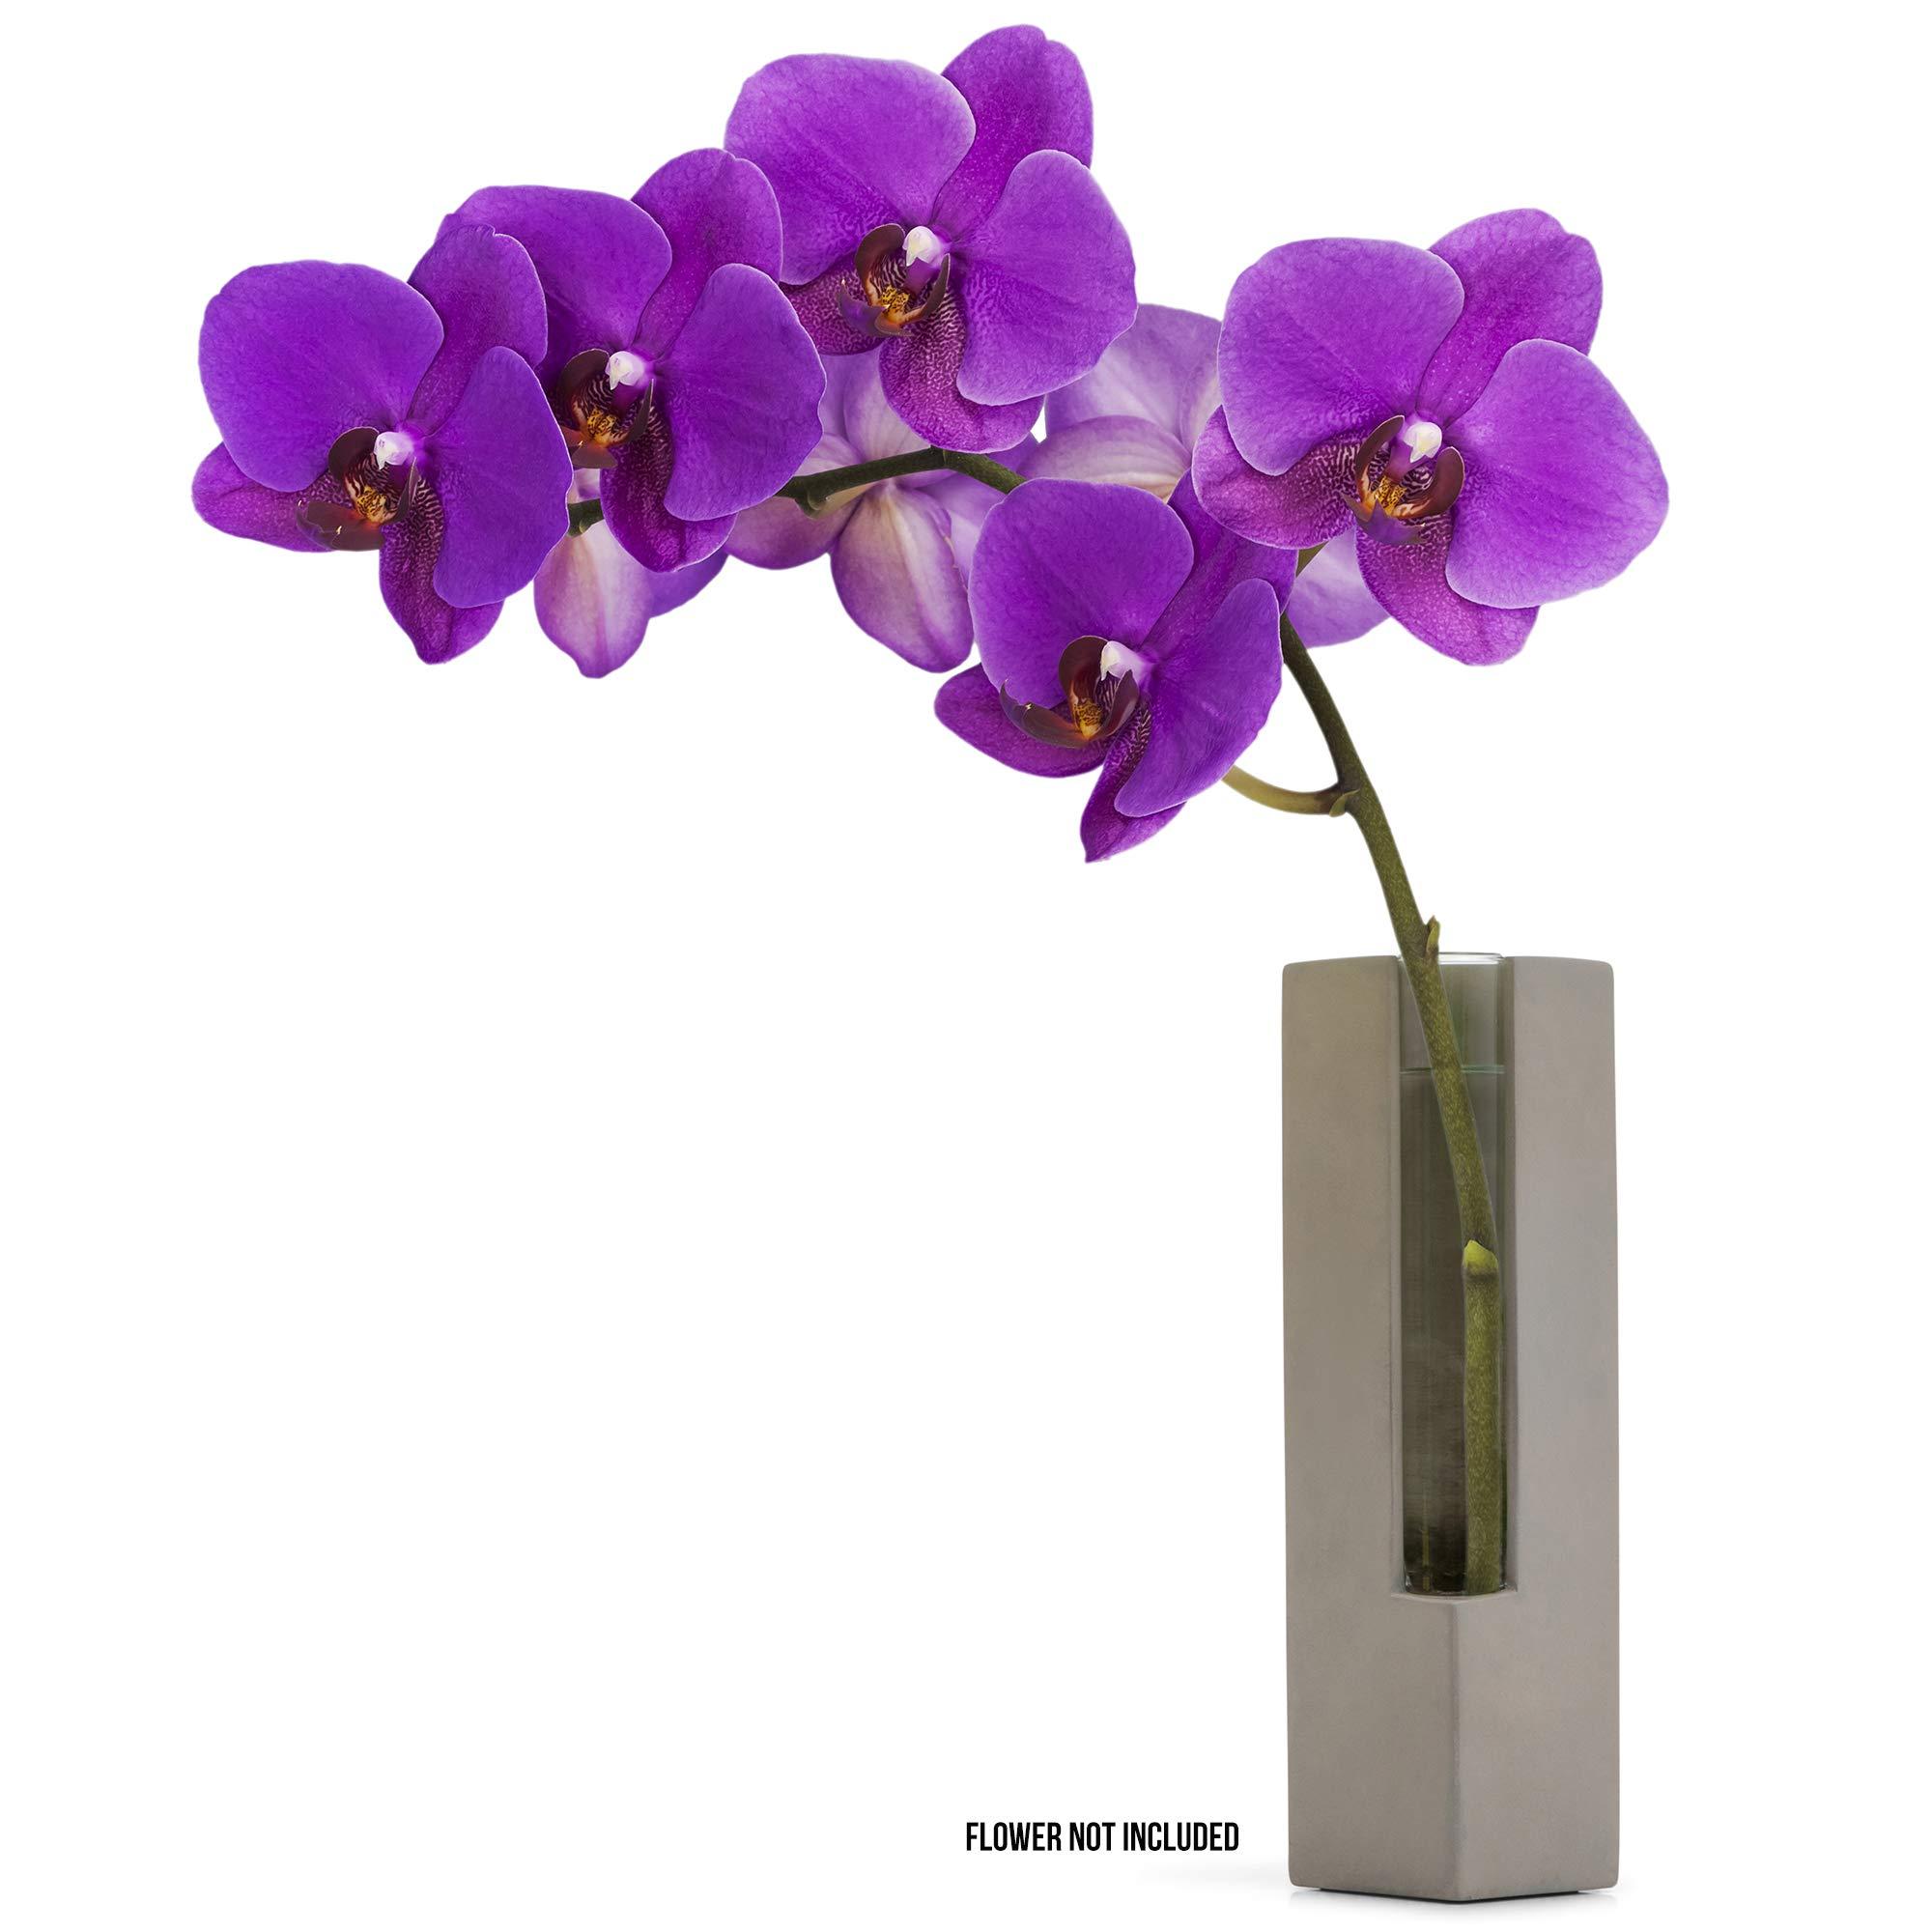 "Casadorna Modern Flower Vase Glass Tube with Polished Concrete - Orchid Bud Vase Glass Tube Flower Vase | Decorative Centerpiece for Table Wedding Hotel Office Home Decor Floral Display | 8"" H"